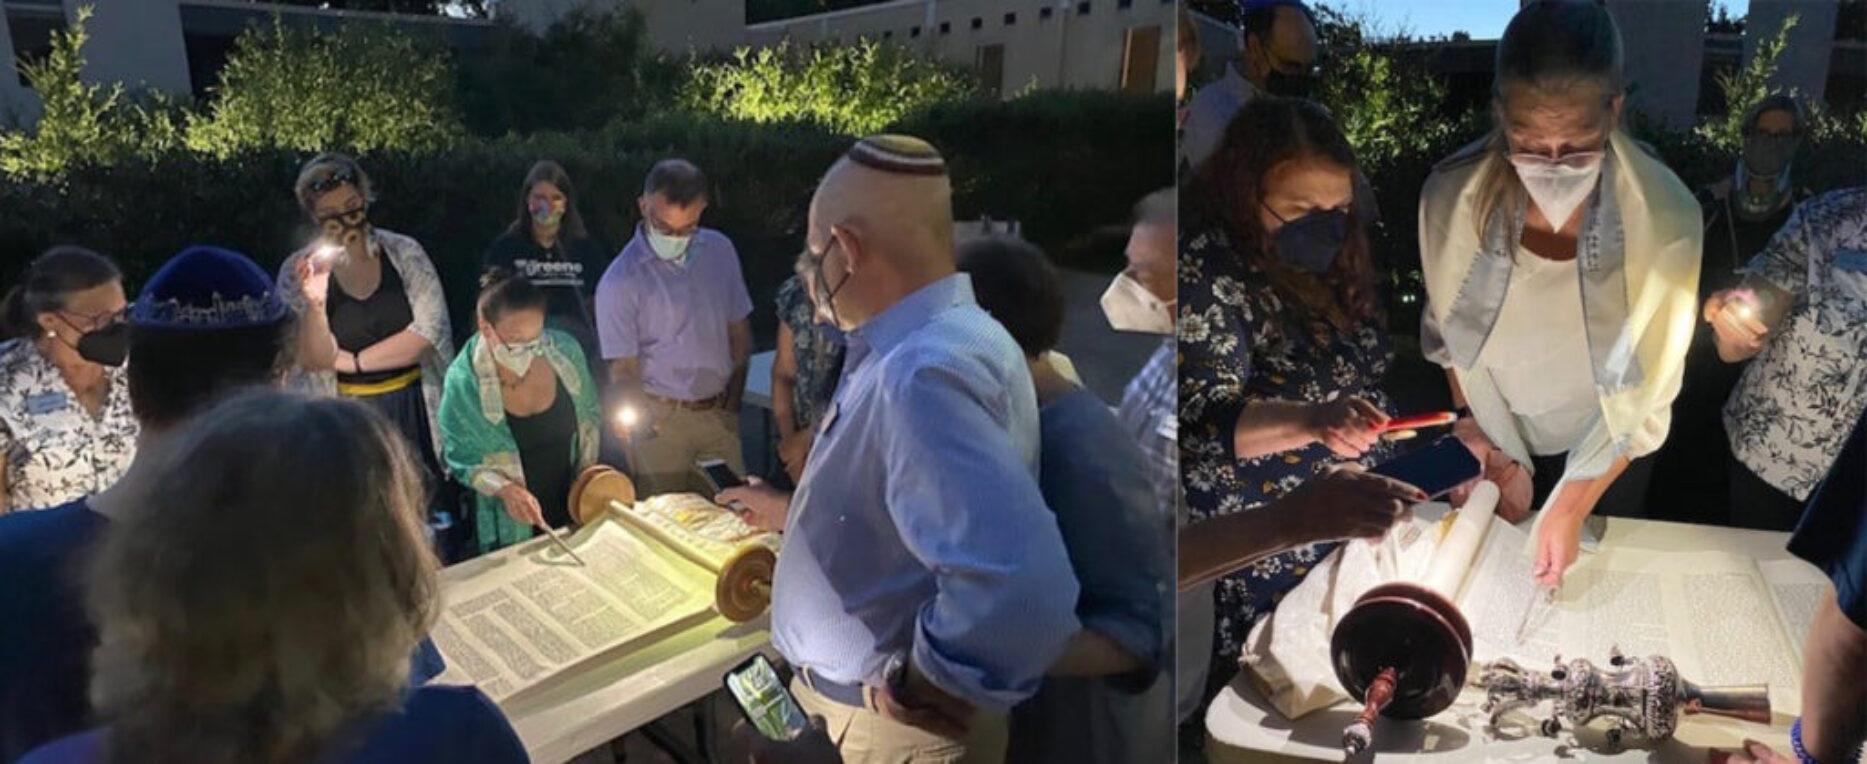 Simchat Torah Pics for website